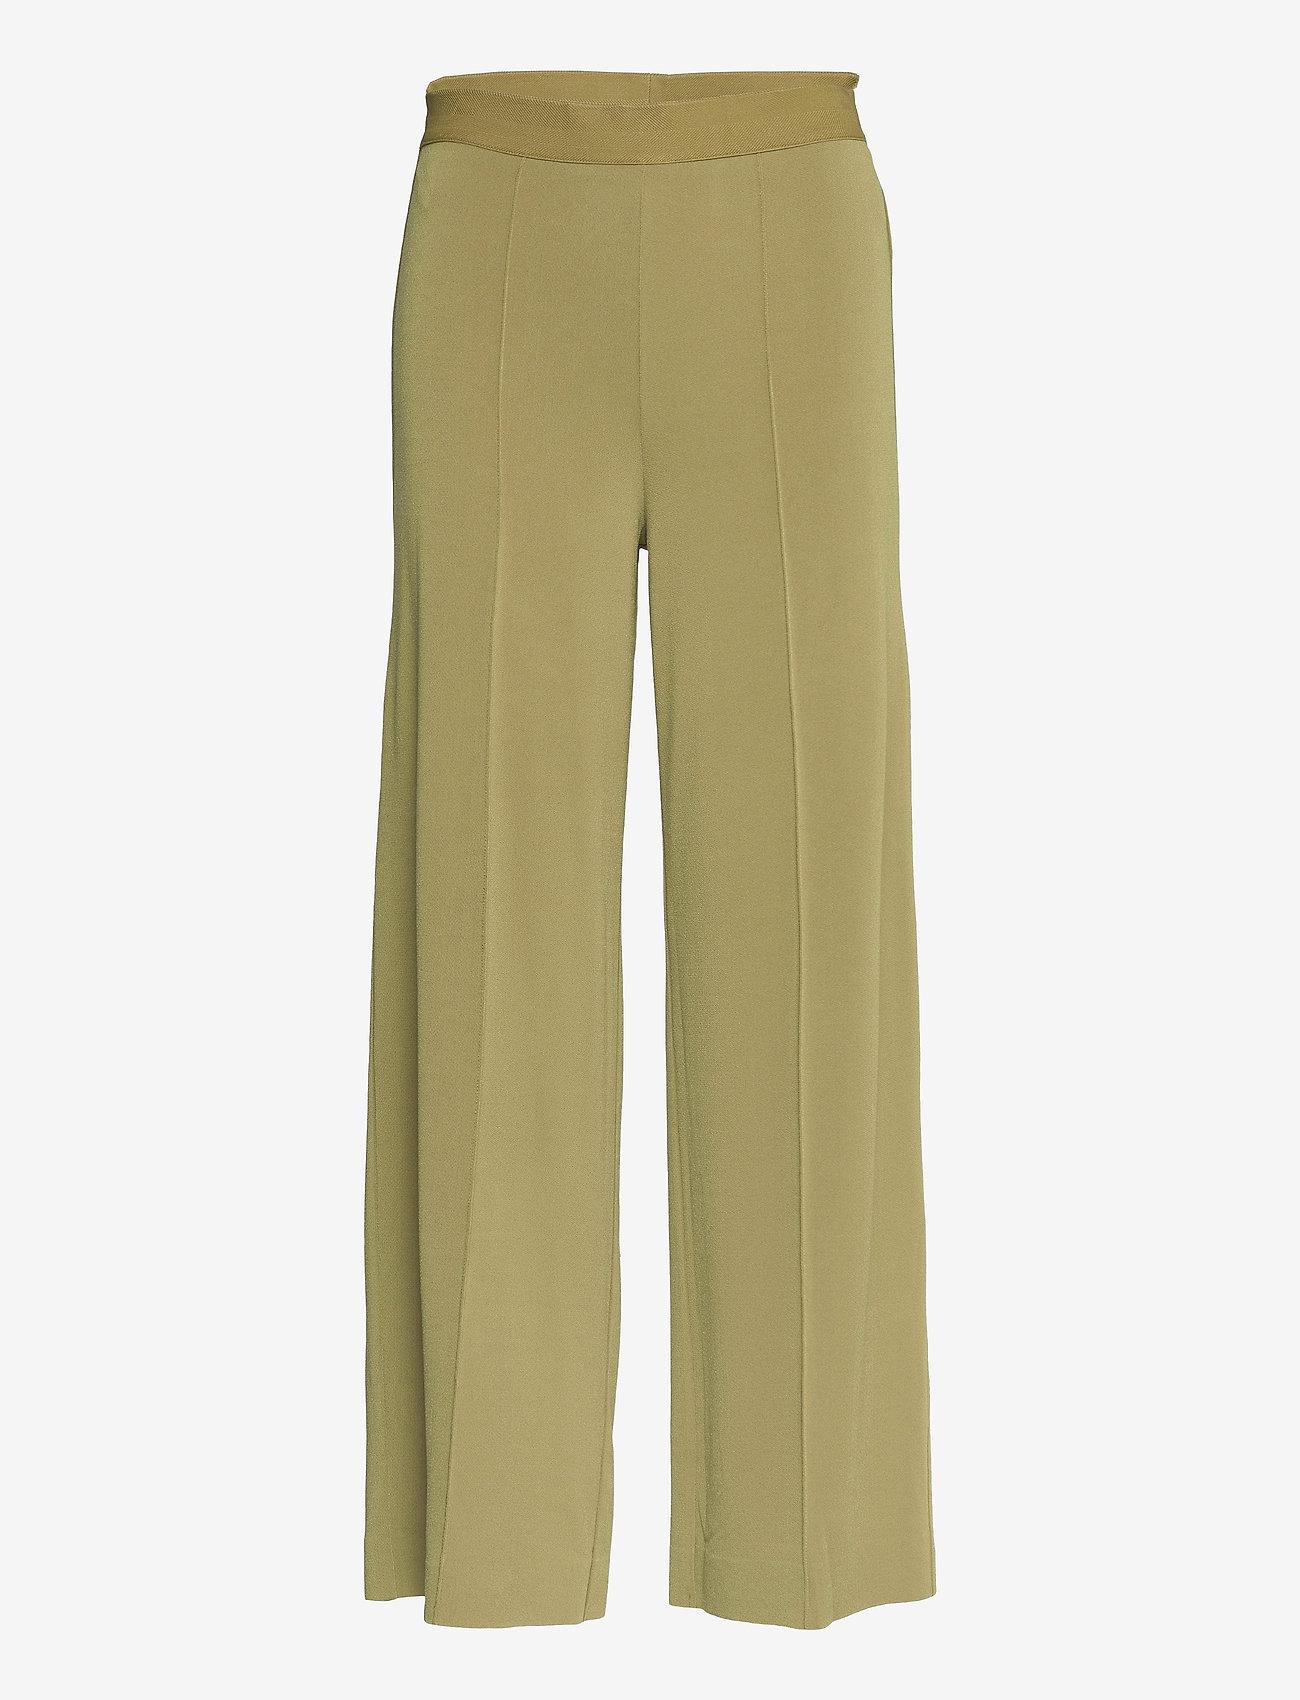 By Malene Birger - MIELA - bukser med brede ben - golden beige - 0